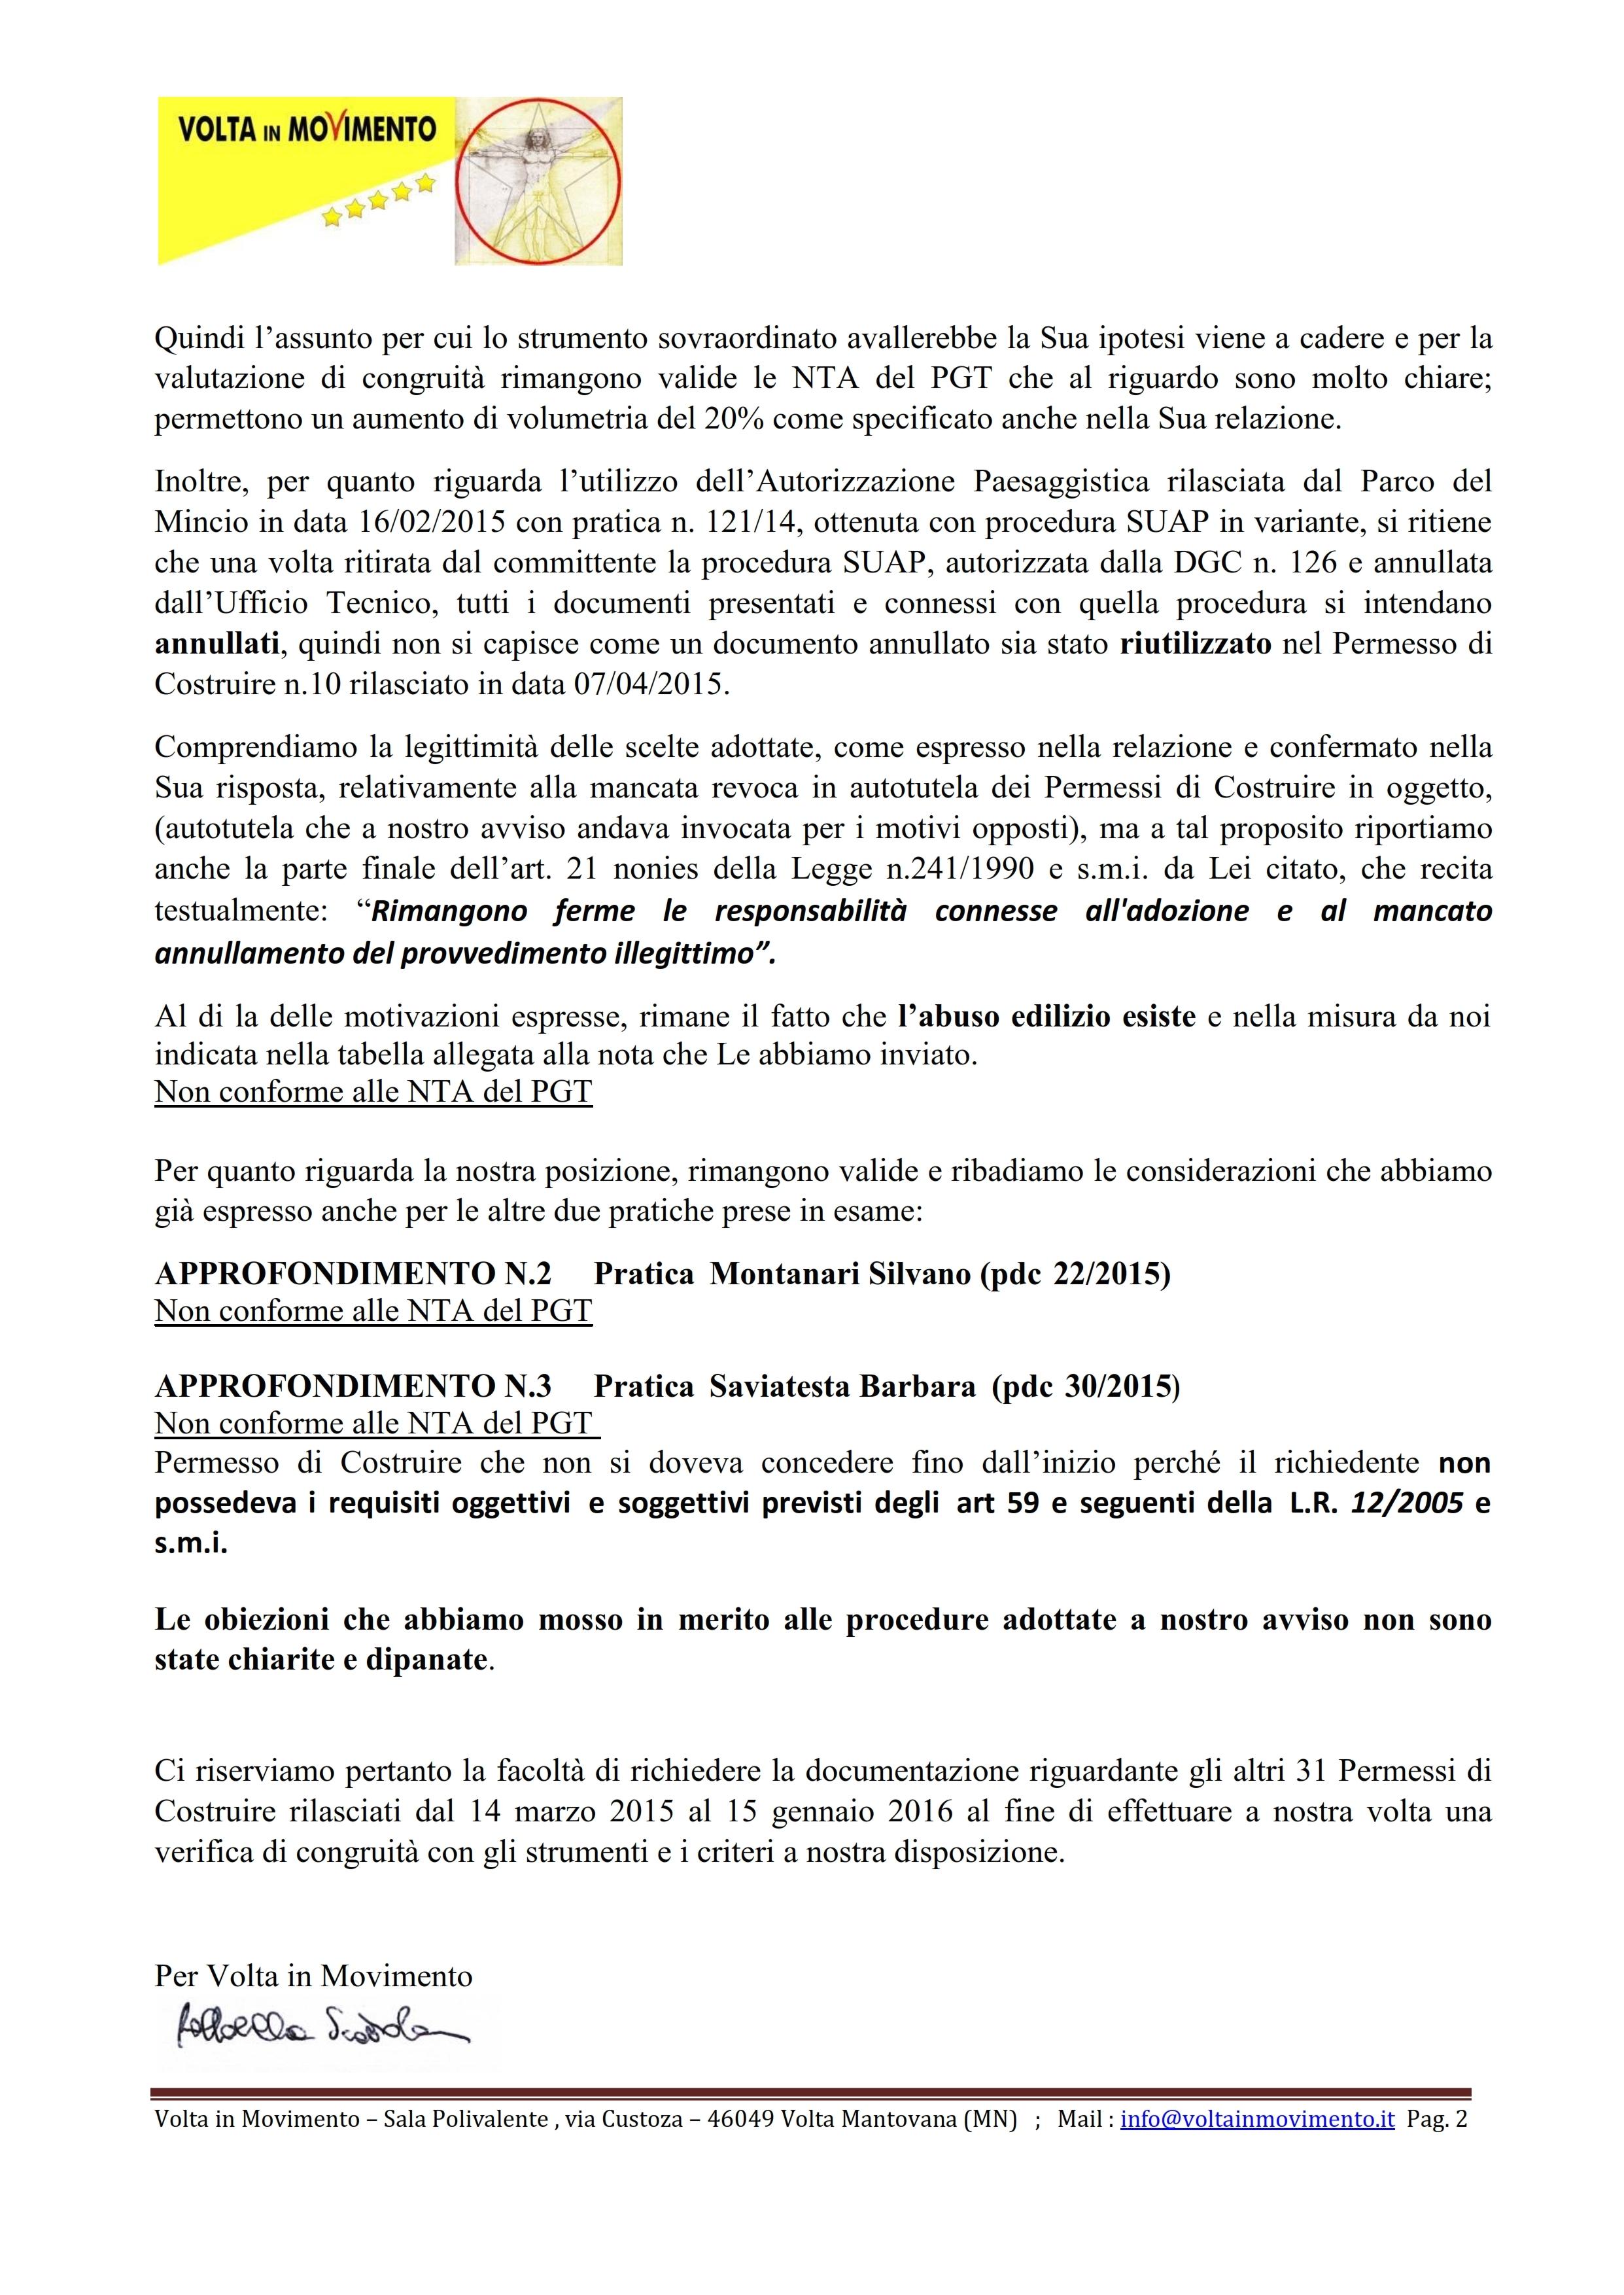 replica-al-geom-gianluca-milani-25-ottobre-2016_002